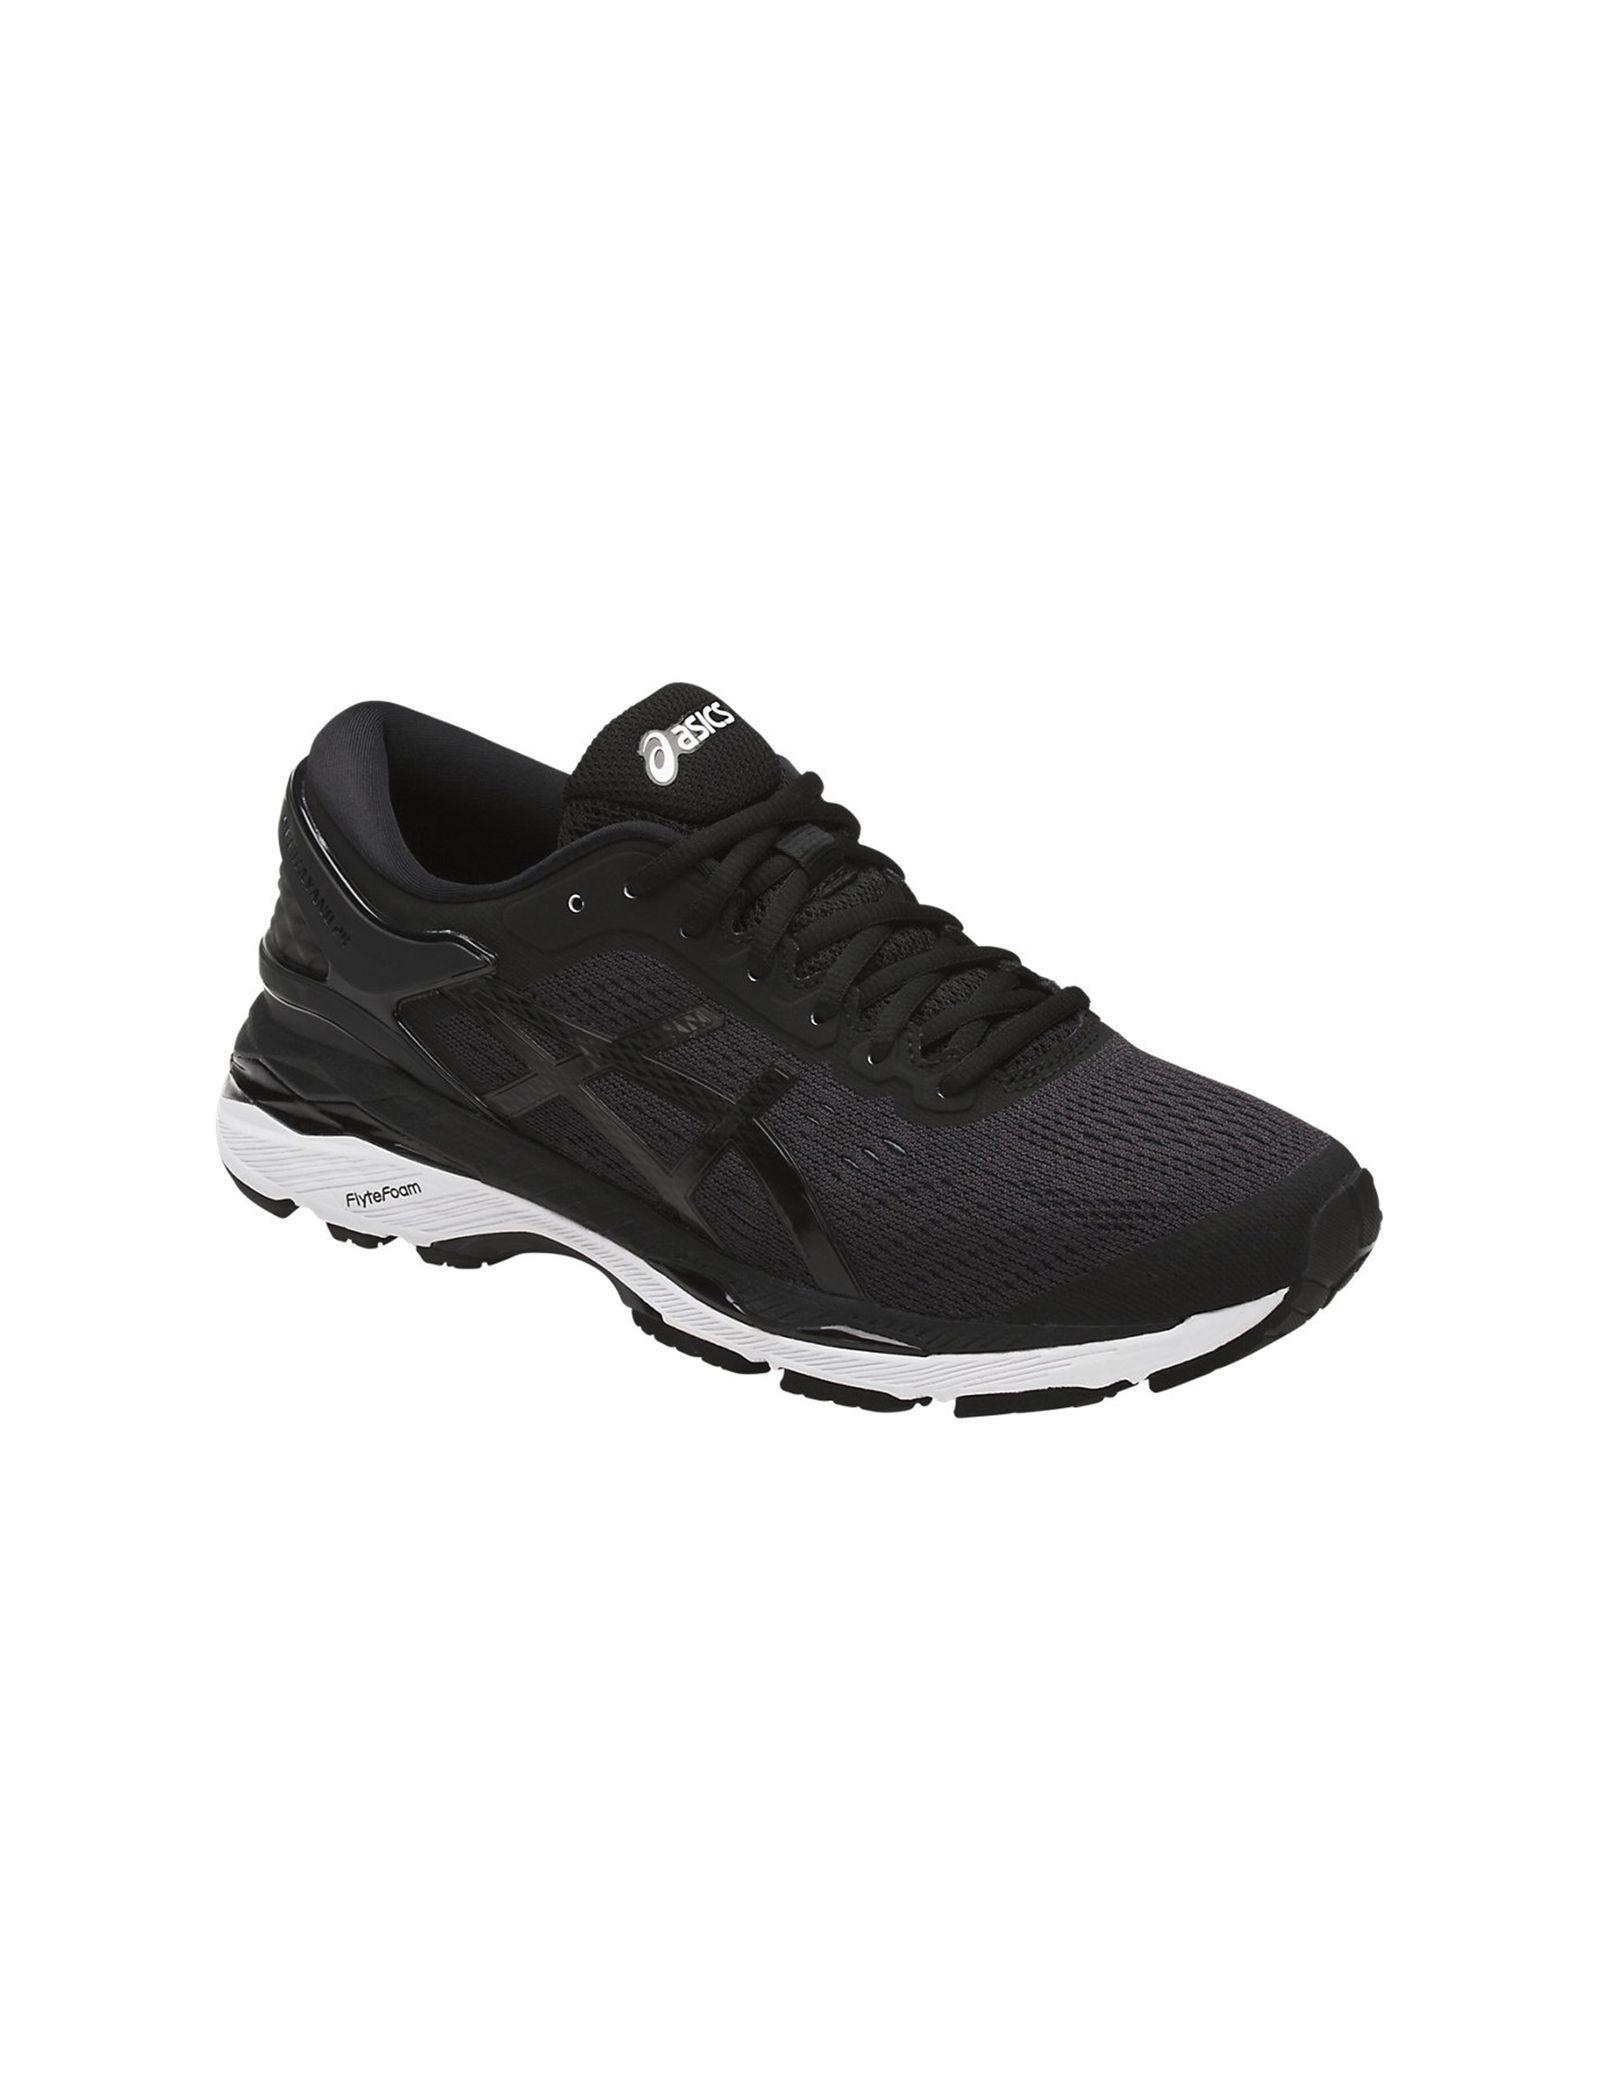 کفش دویدن بندی زنانه GEL-KAYANO 24 - اسیکس - مشکي - 6